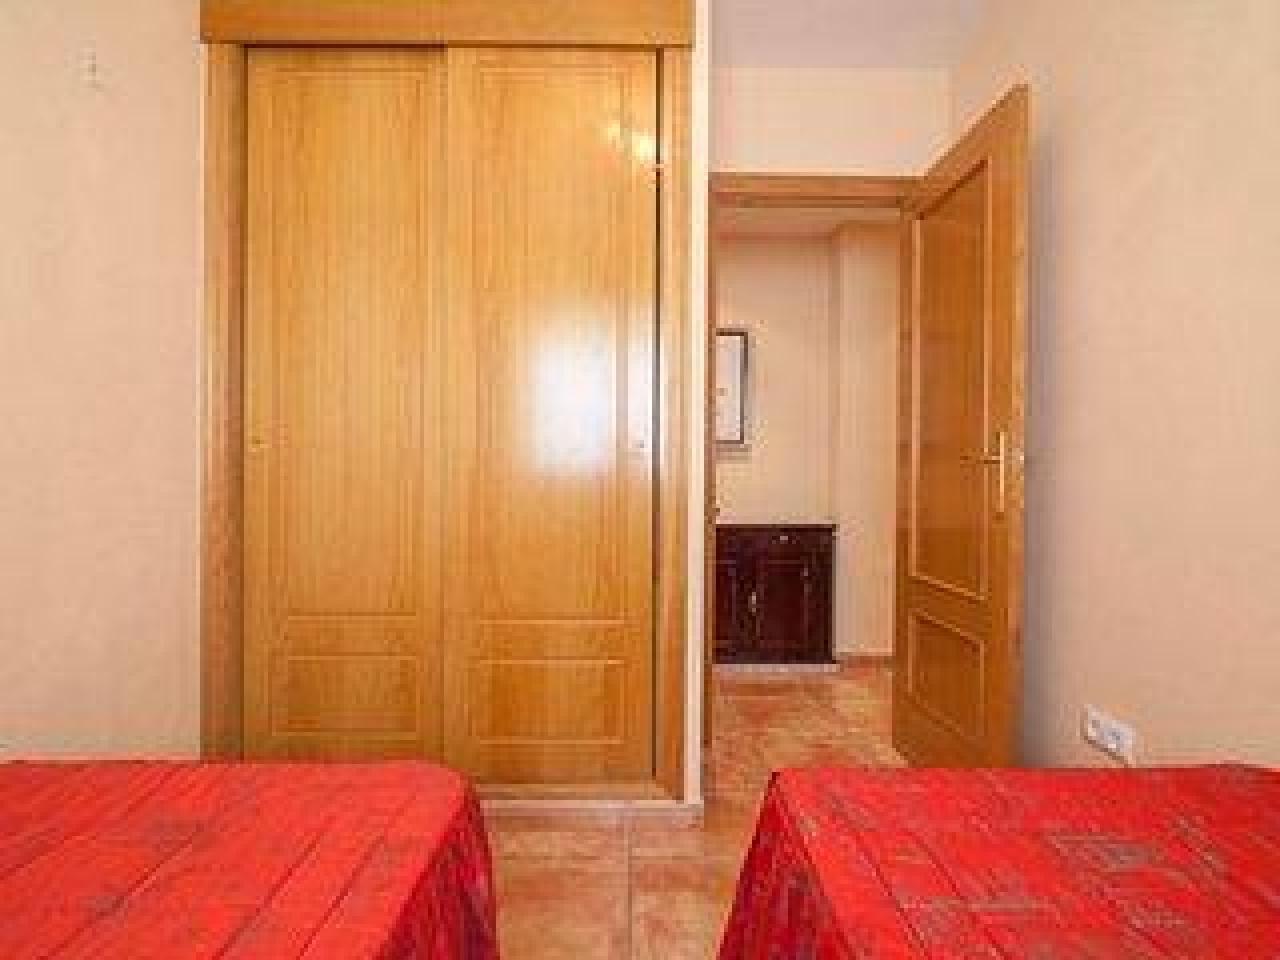 Apartamentos en alquiler Grau i Platja, Valencia